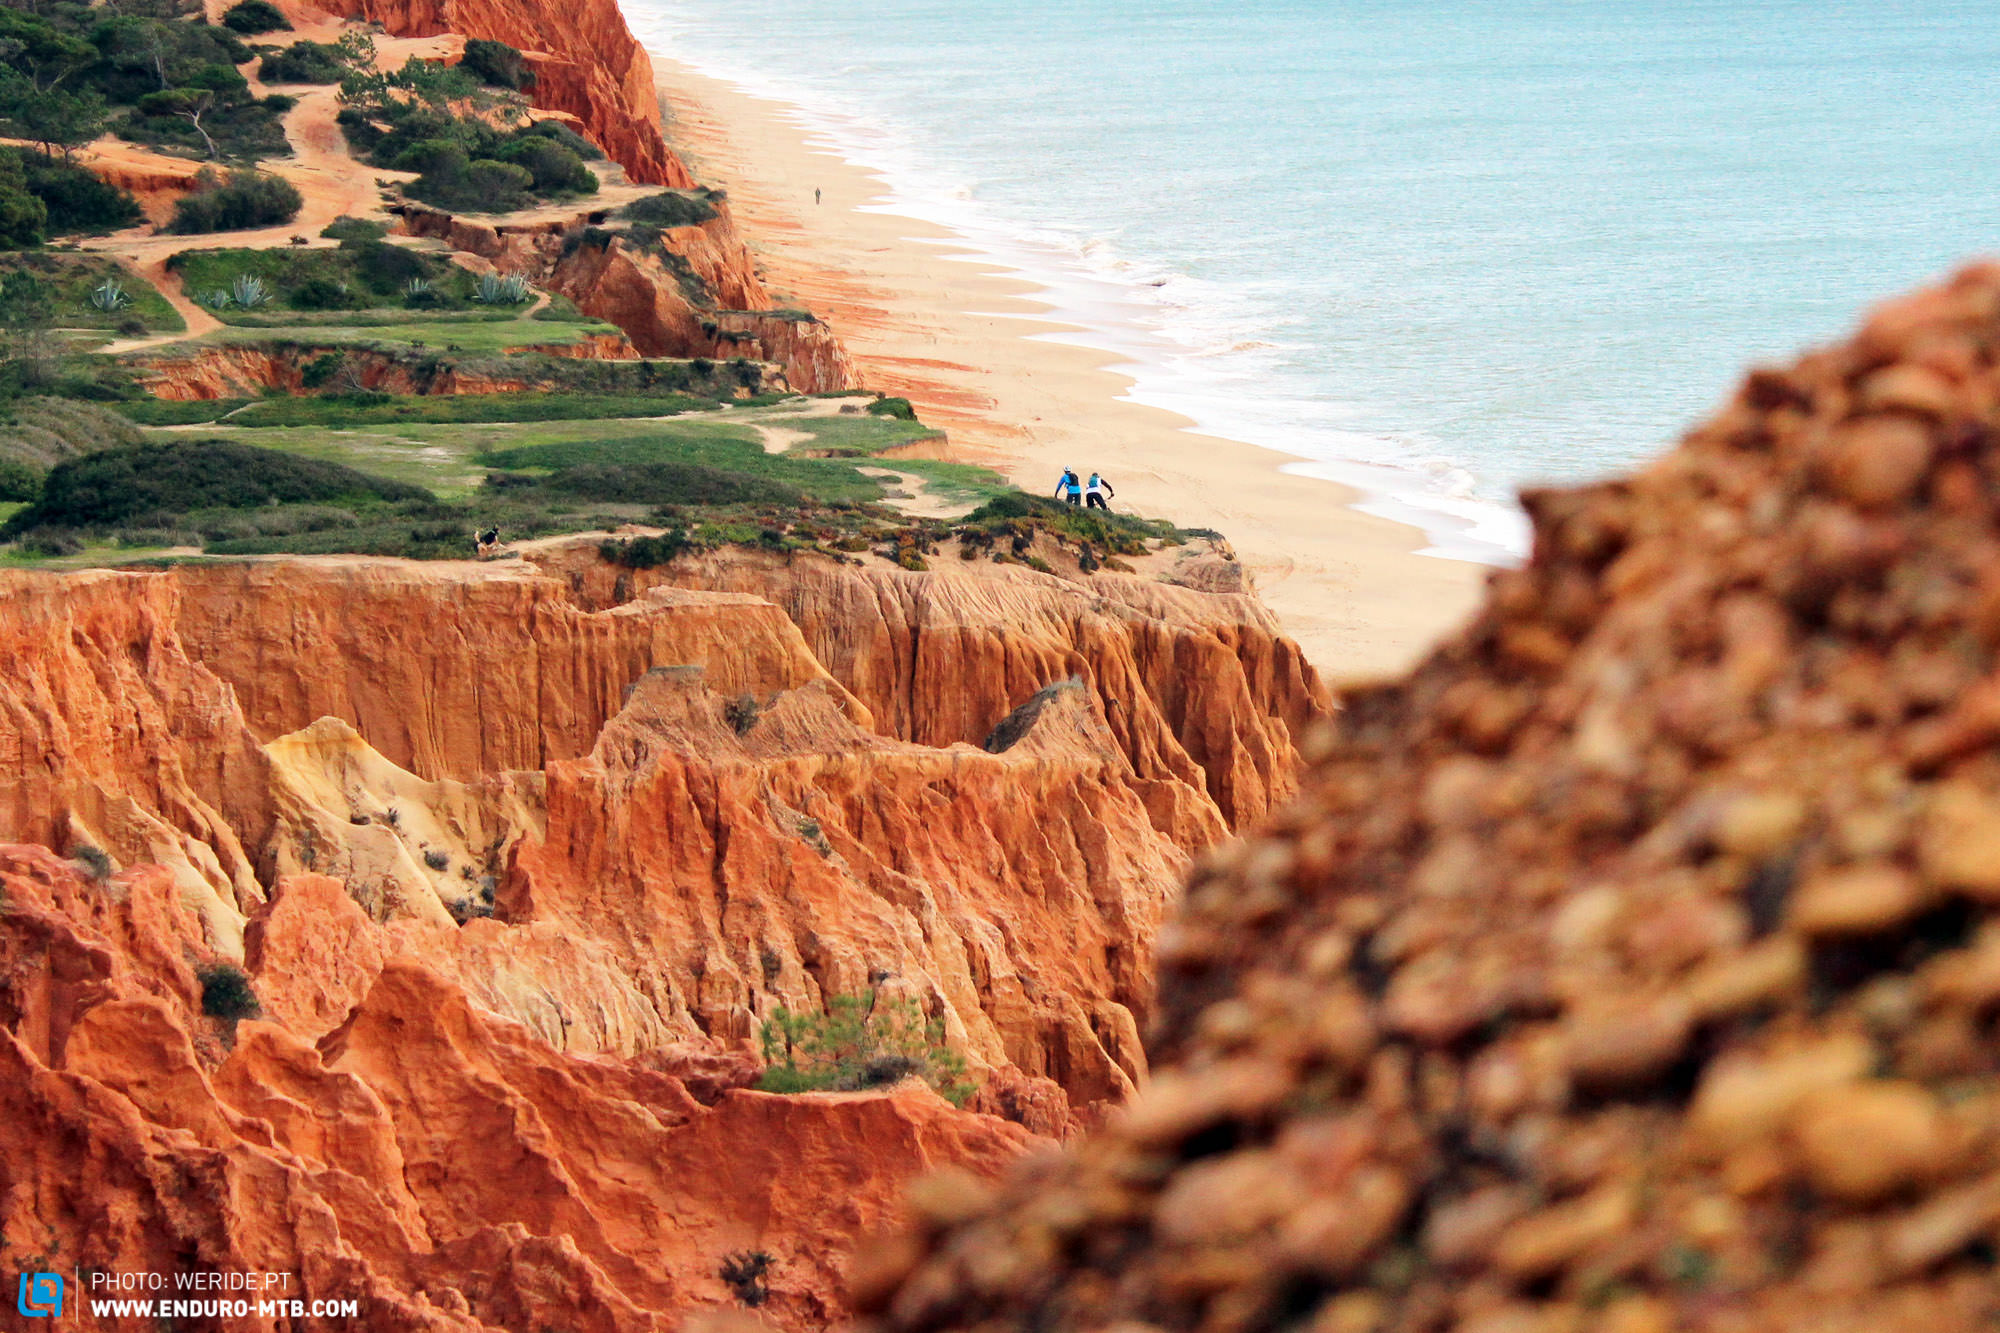 Travel-Story-Portugal-Algave-2.jpg